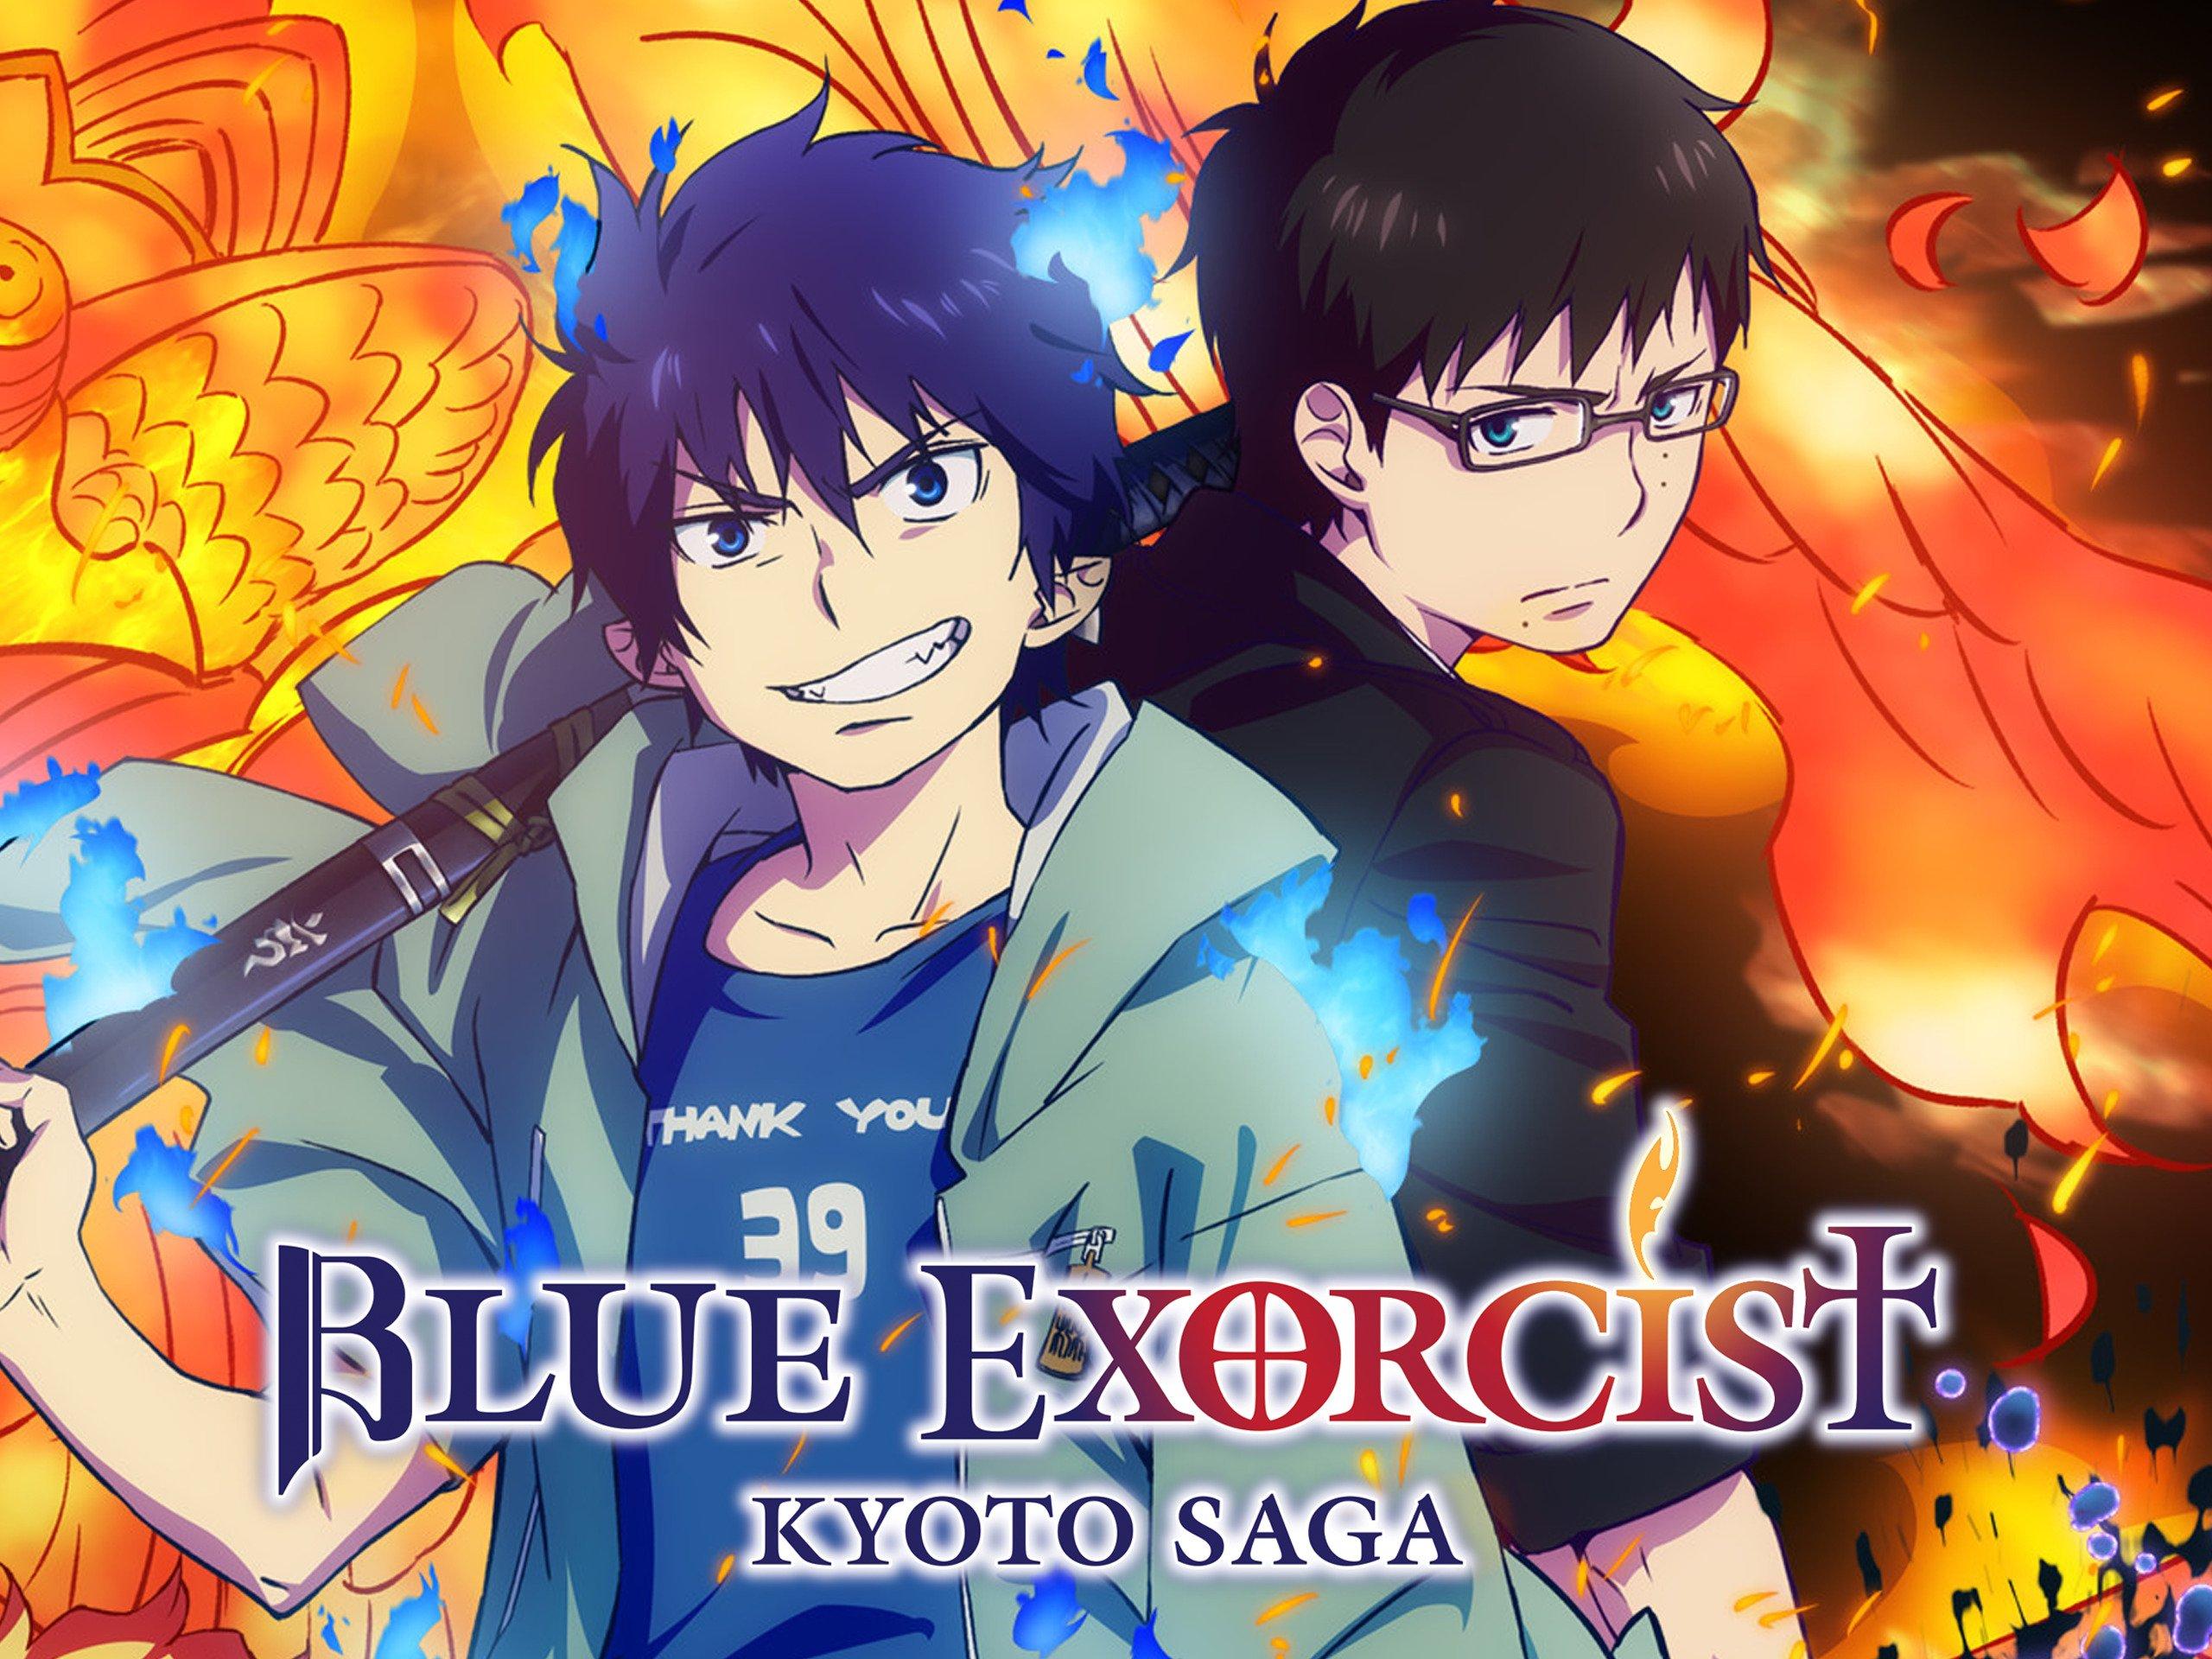 blue exorcist season 2 episode 1 free online